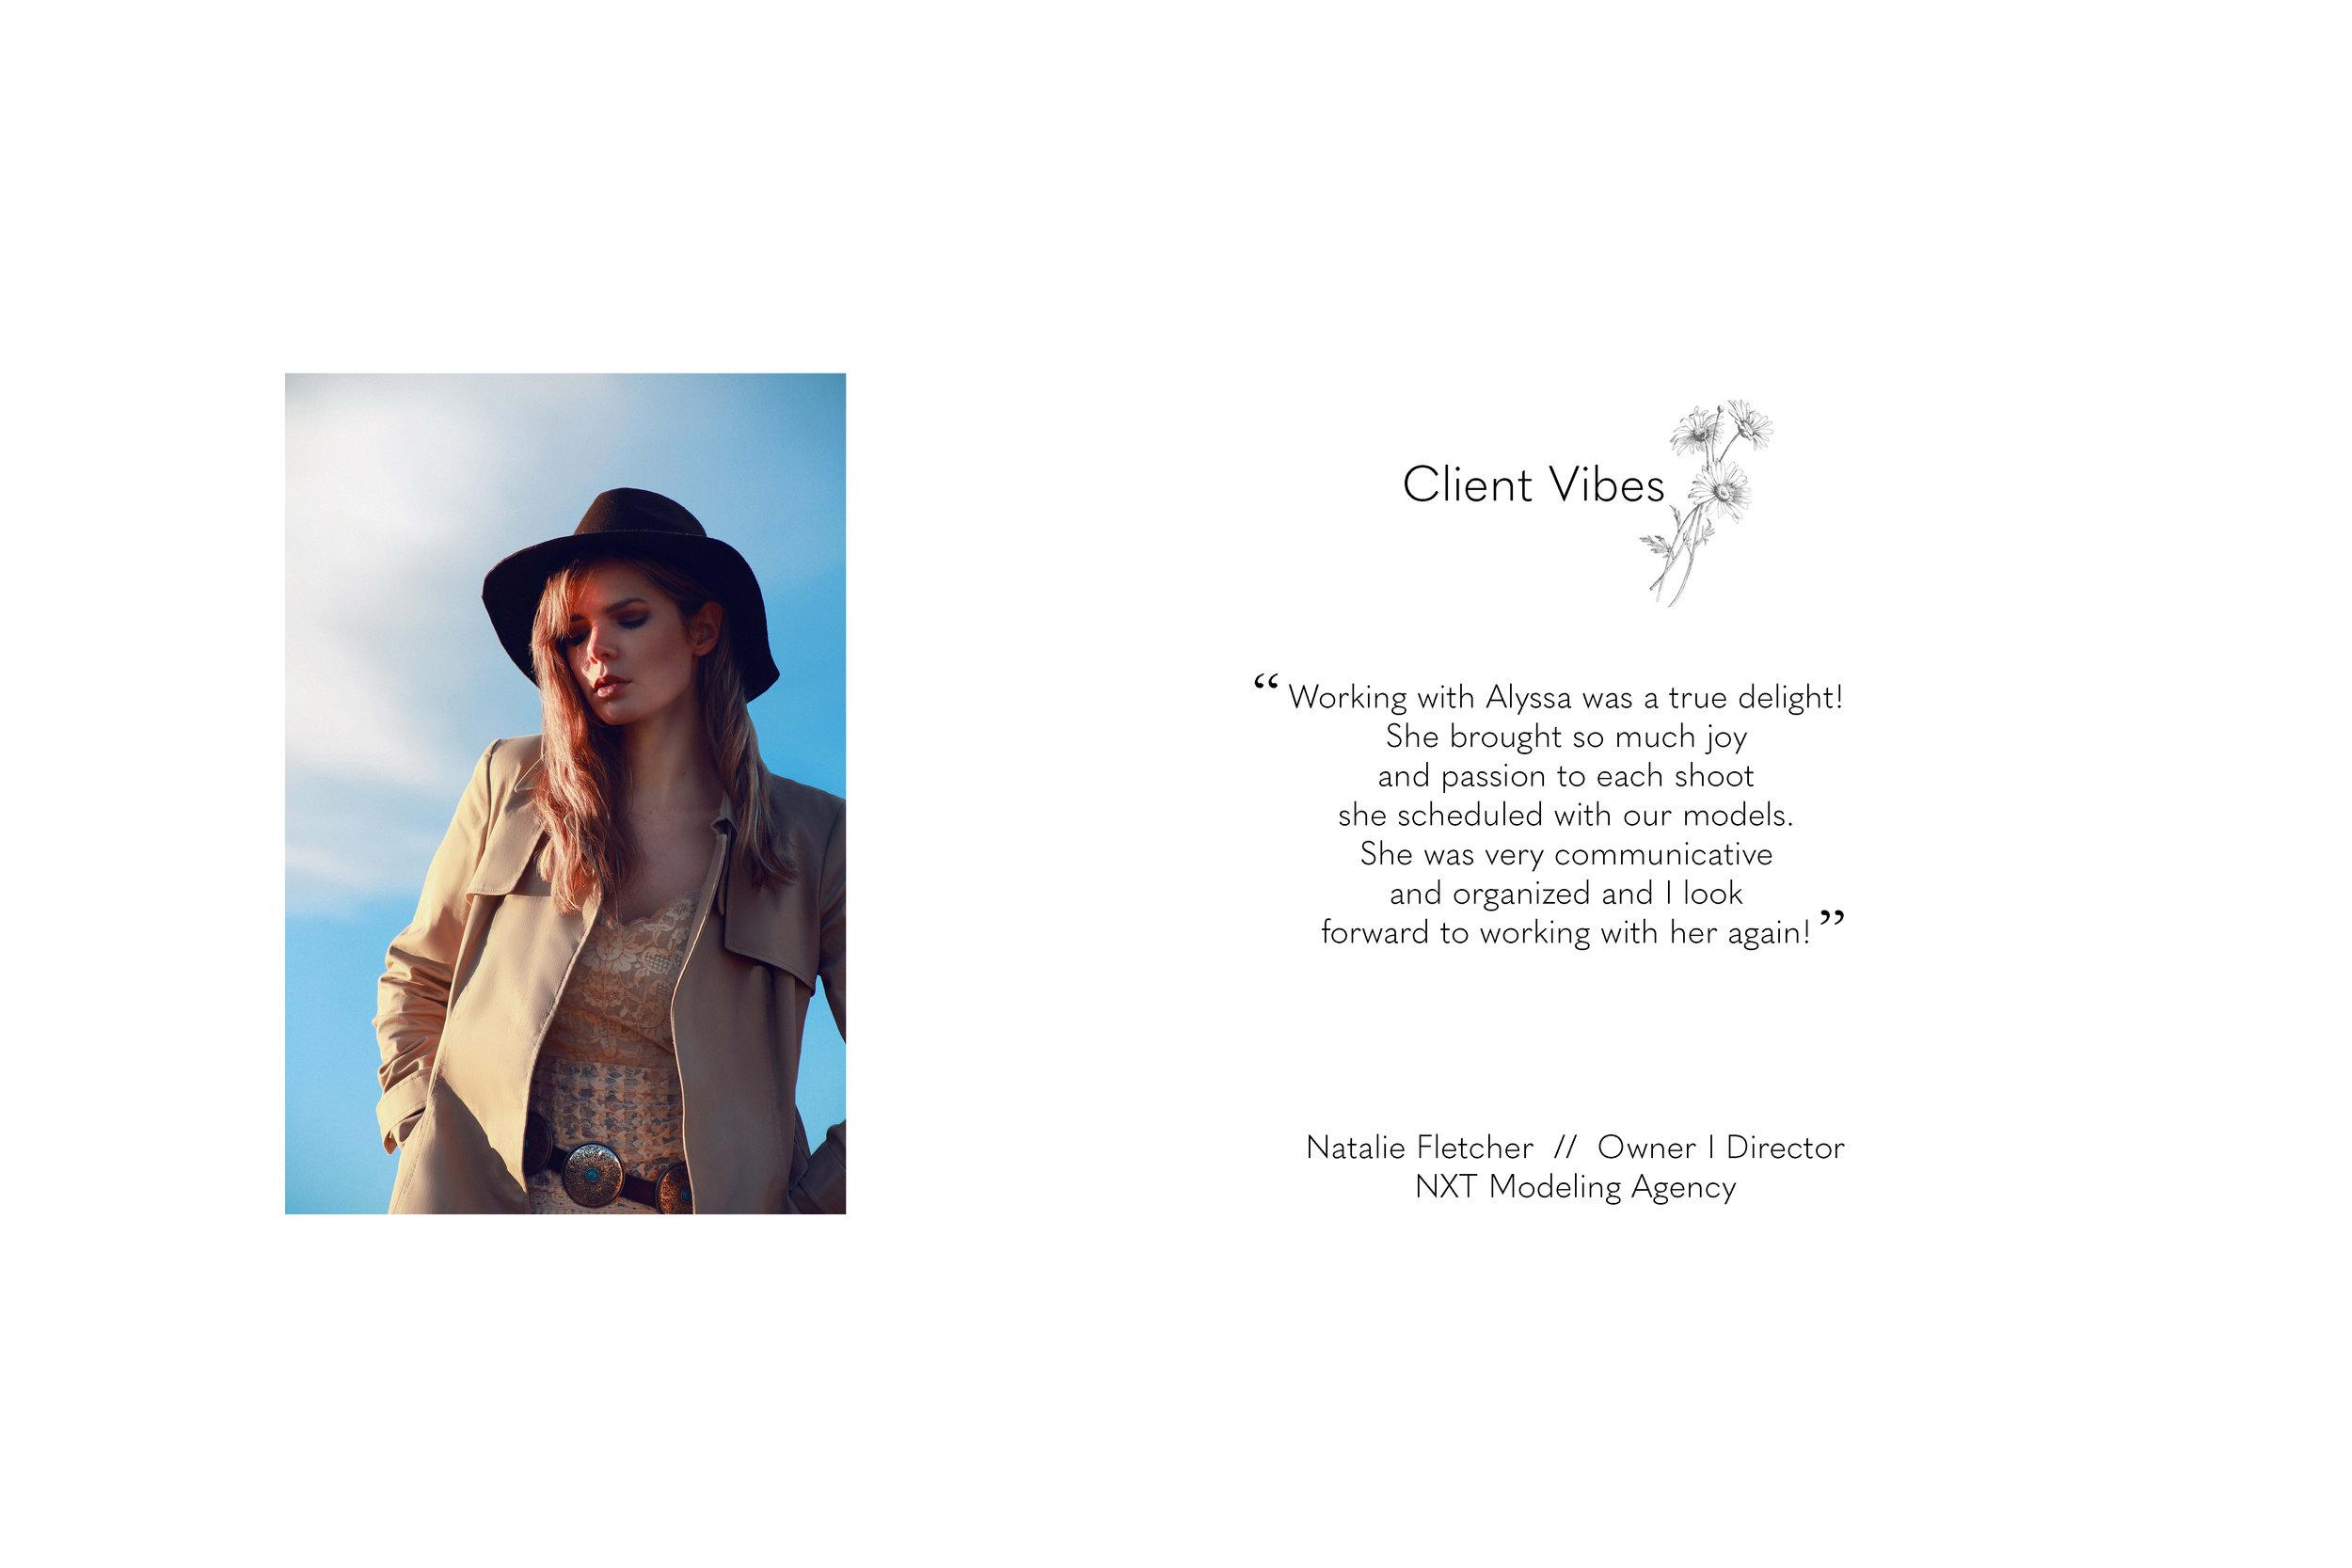 Natalie Fletcher Client Vibes 01.jpg